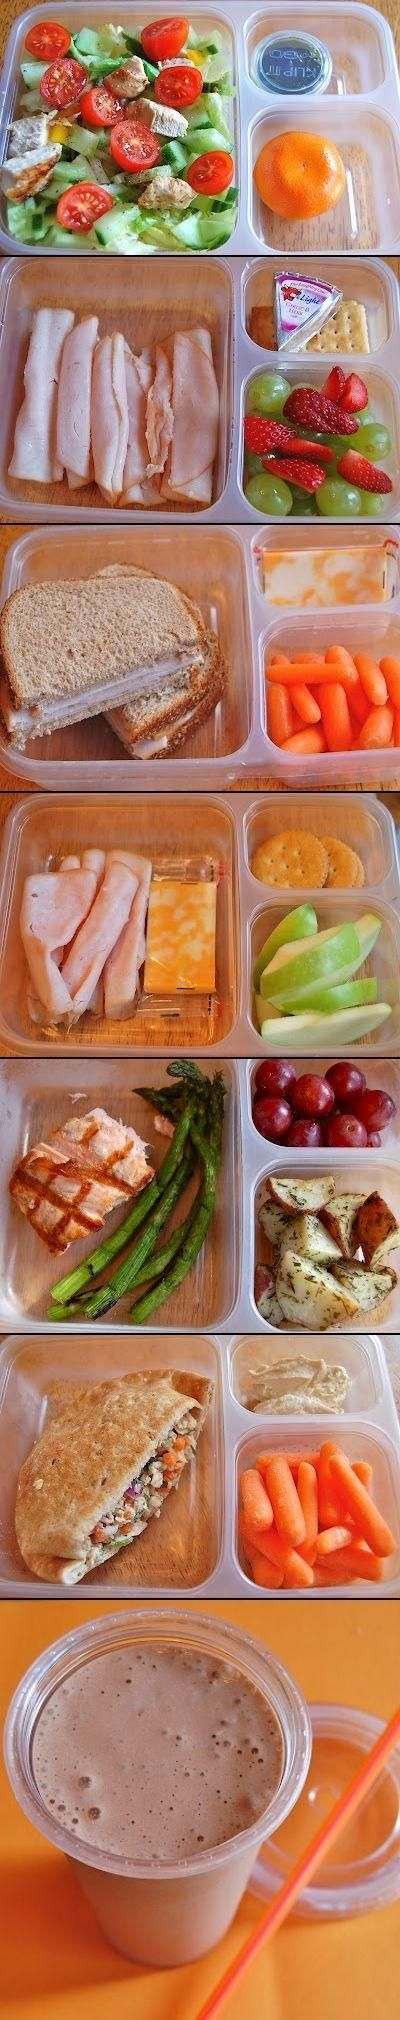 Healthy Lunch Ideas - Joybx                                                                                                                                                     More